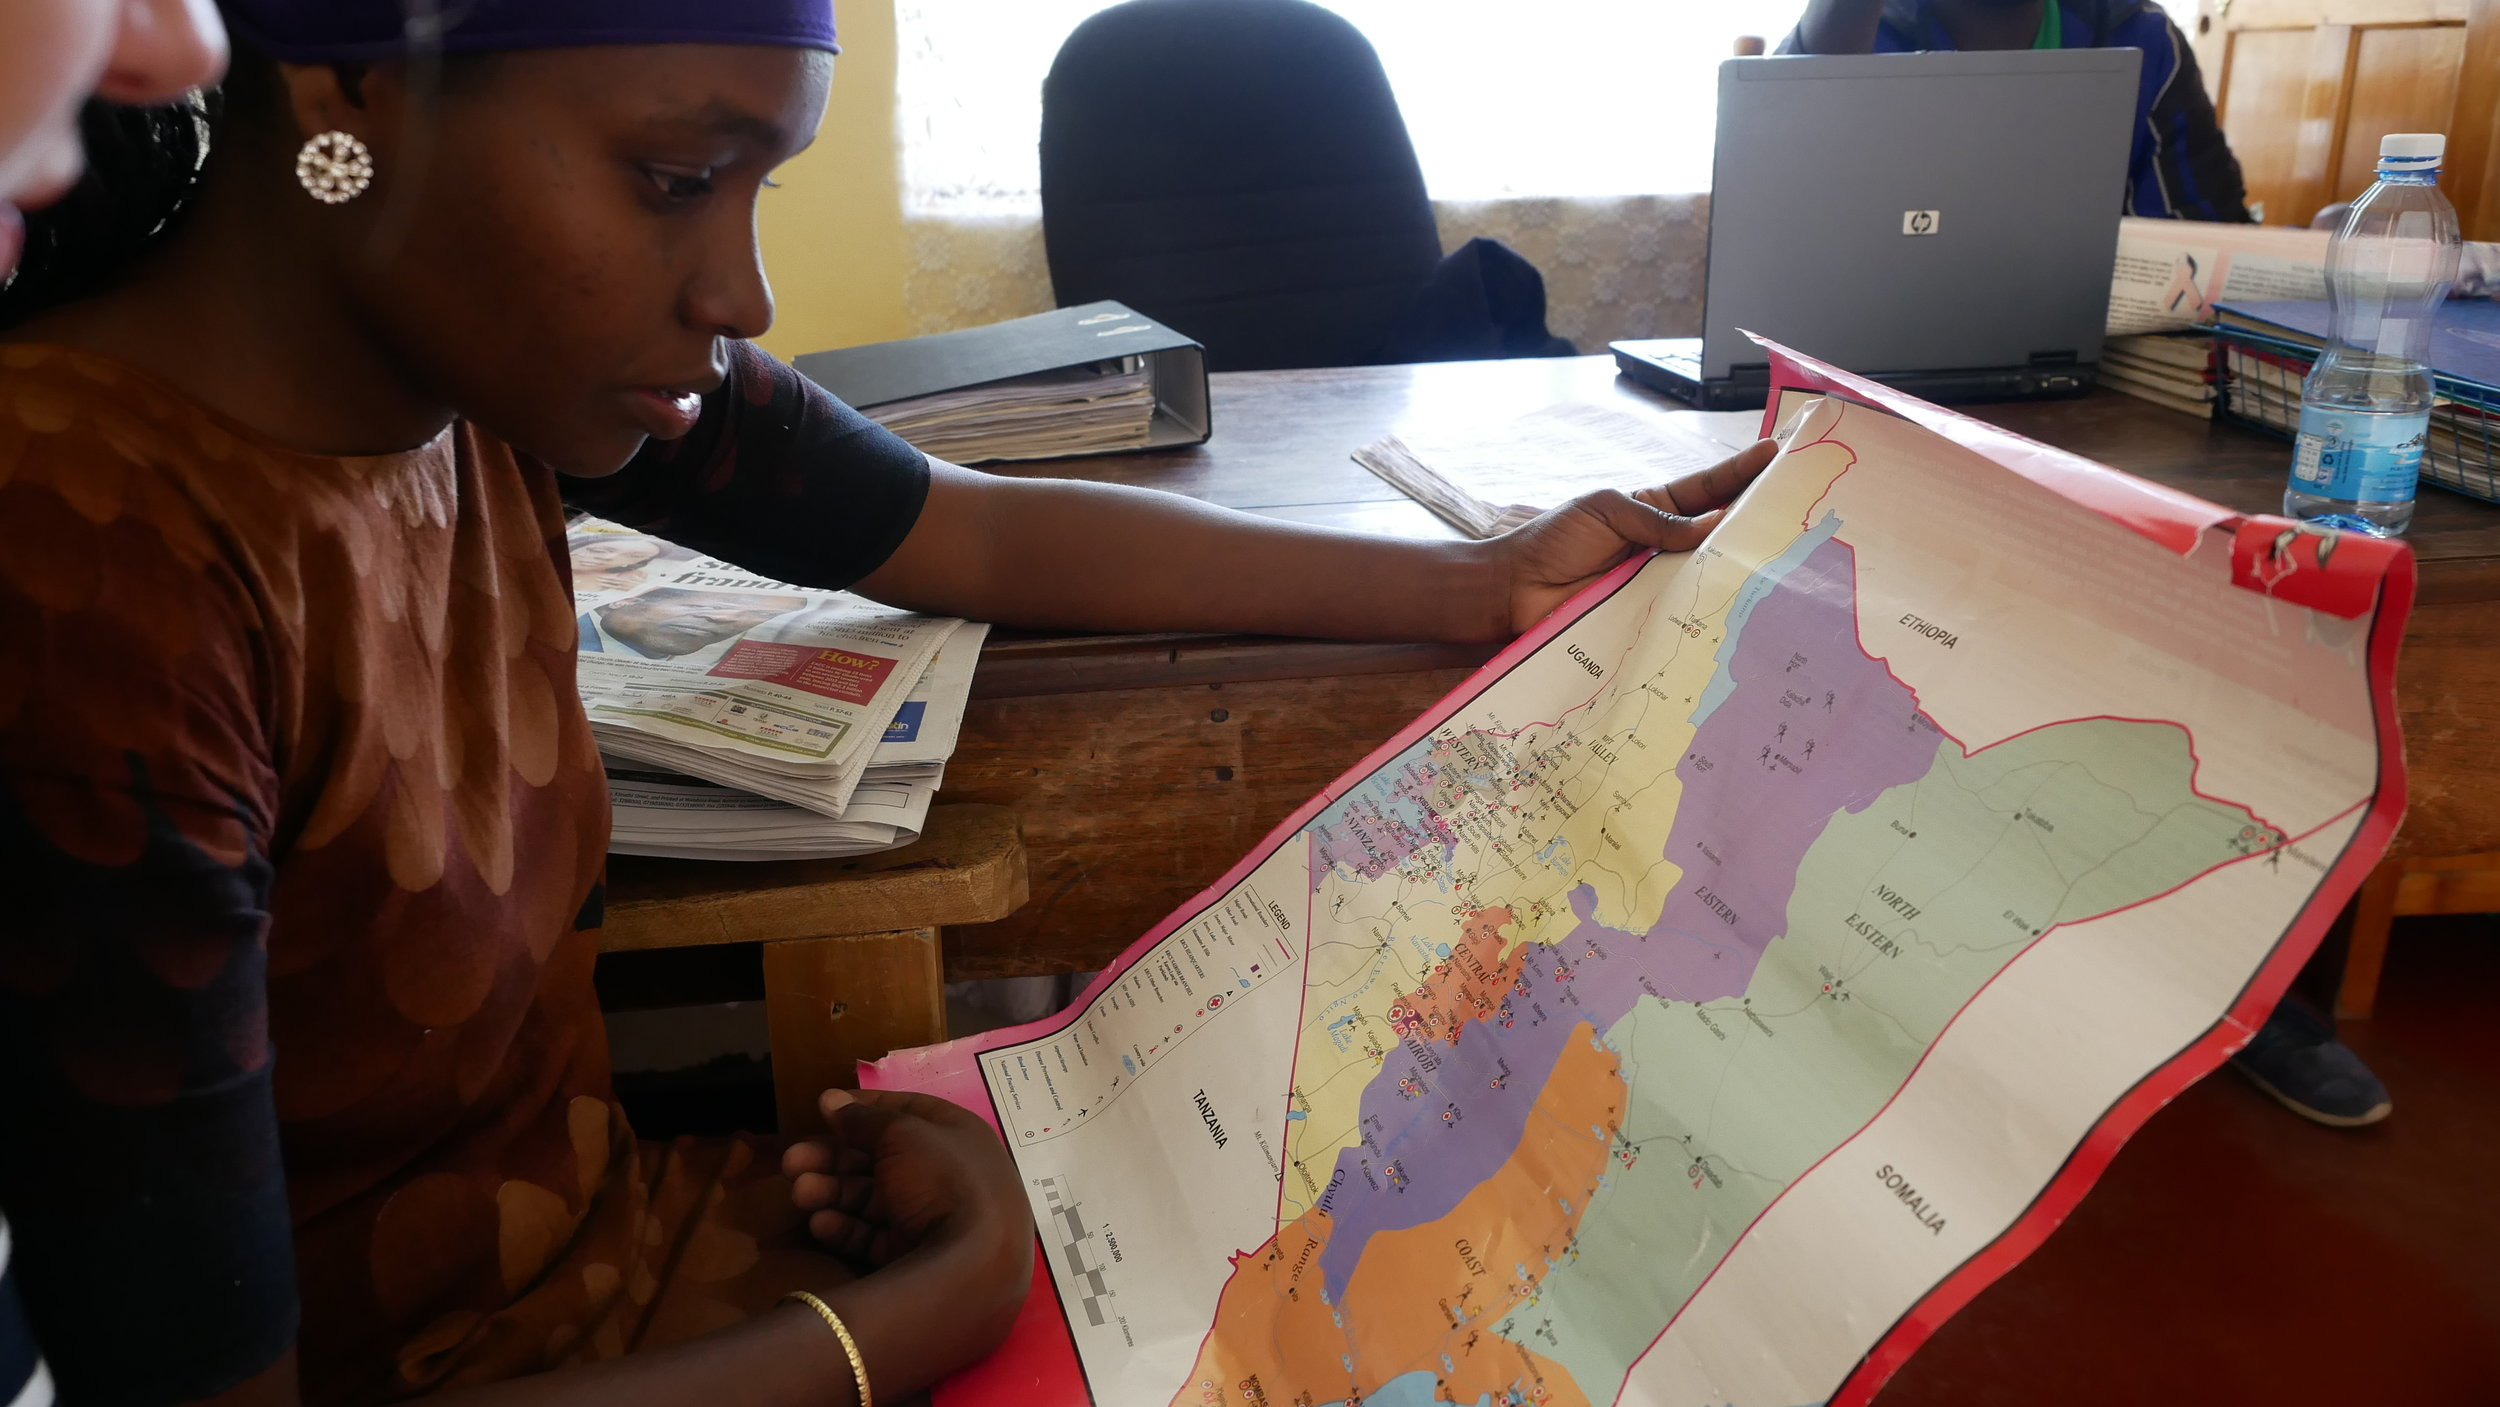 Grace, the office's intern, explaining Kenyan geography. Photo: Elfi Thrane Bemelmans.